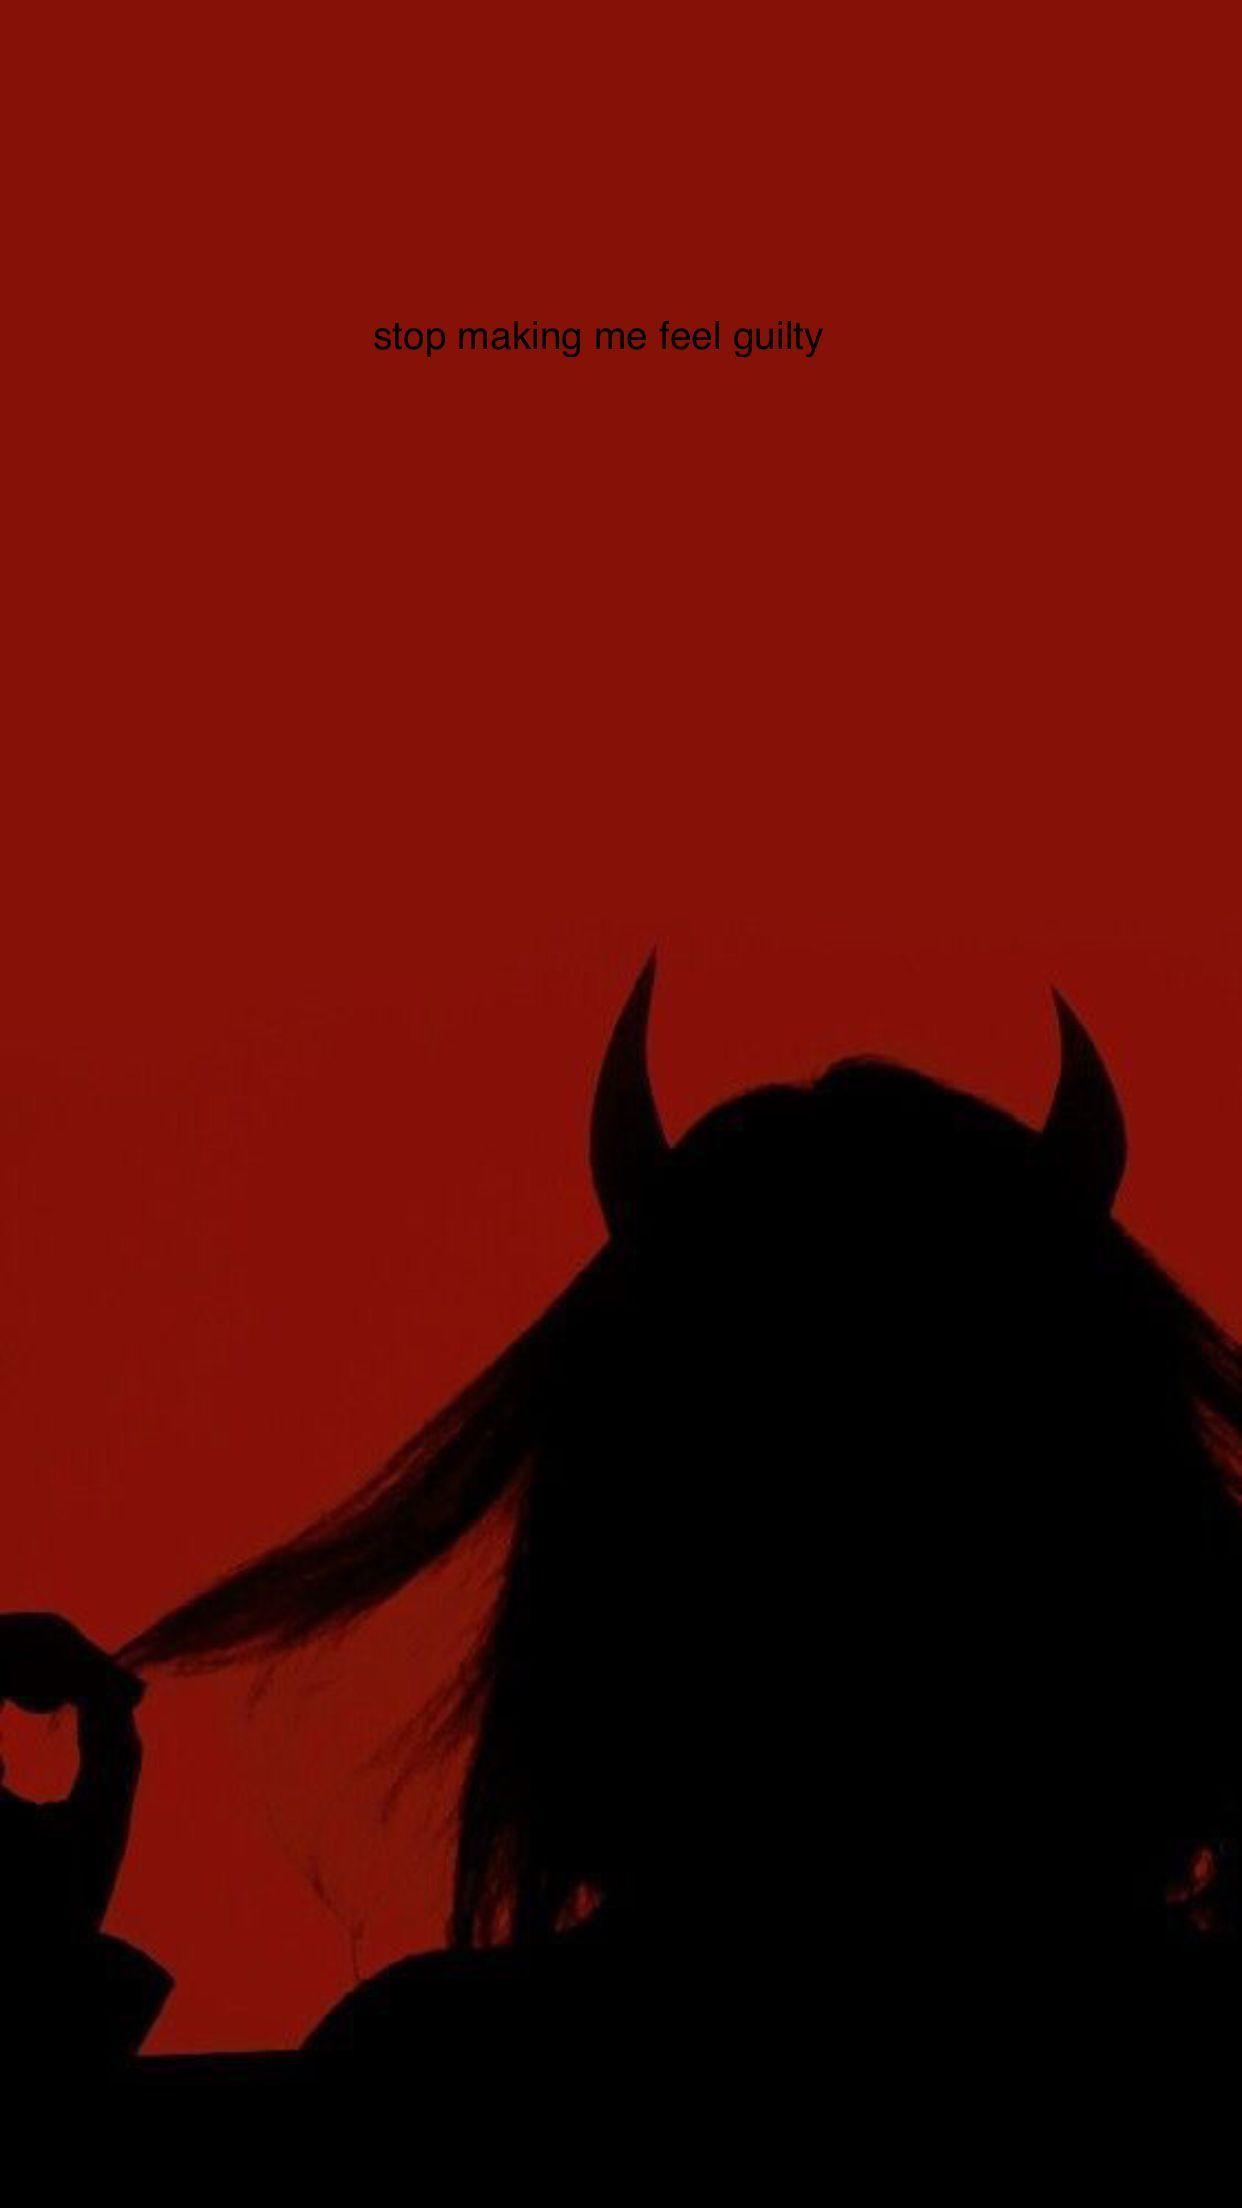 l redaesthetic   dailycomics Bad girl wallpaper Red aesthetic 1242x2208